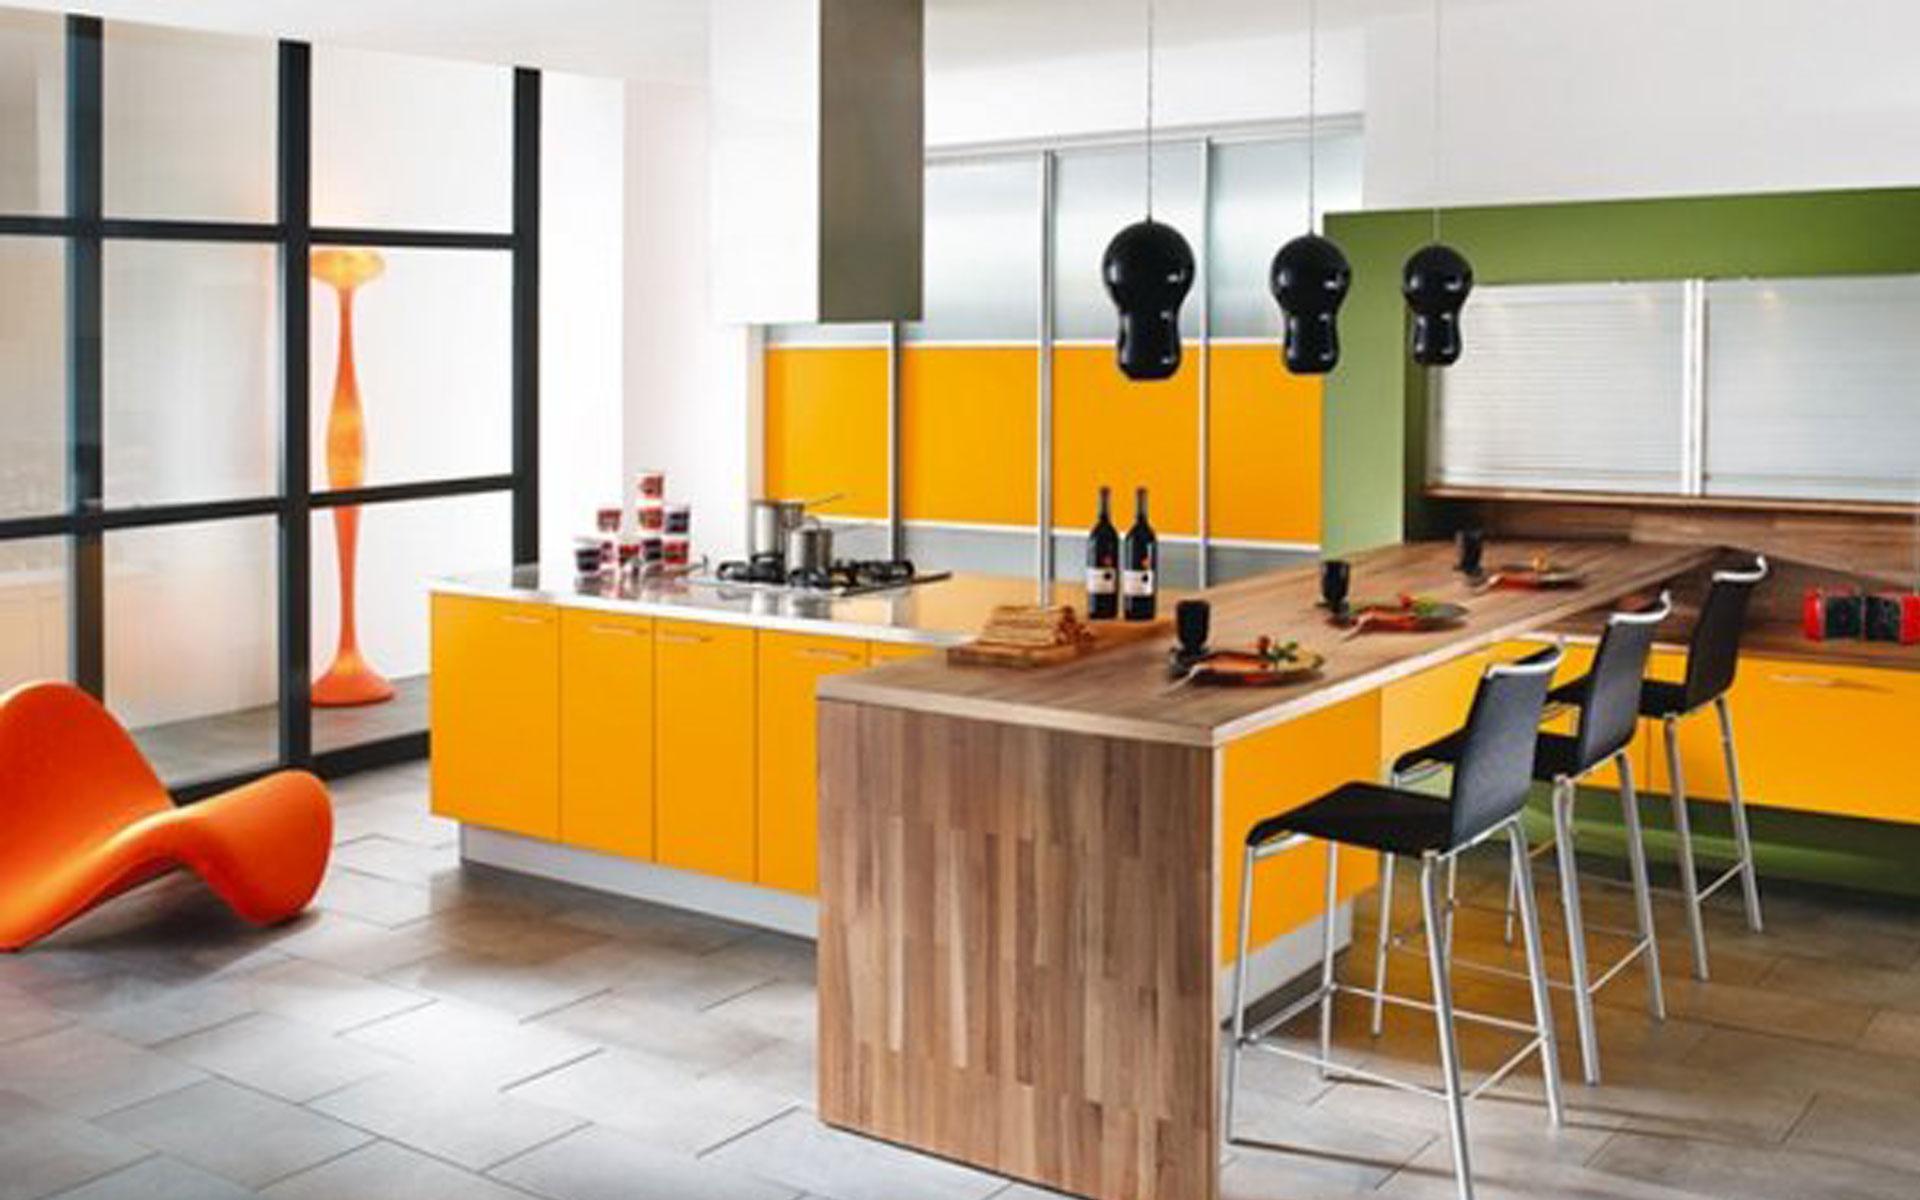 Best Colourful Kitchen Design Ideas ~ Cozinha criativa pra inspirar grandes pratos